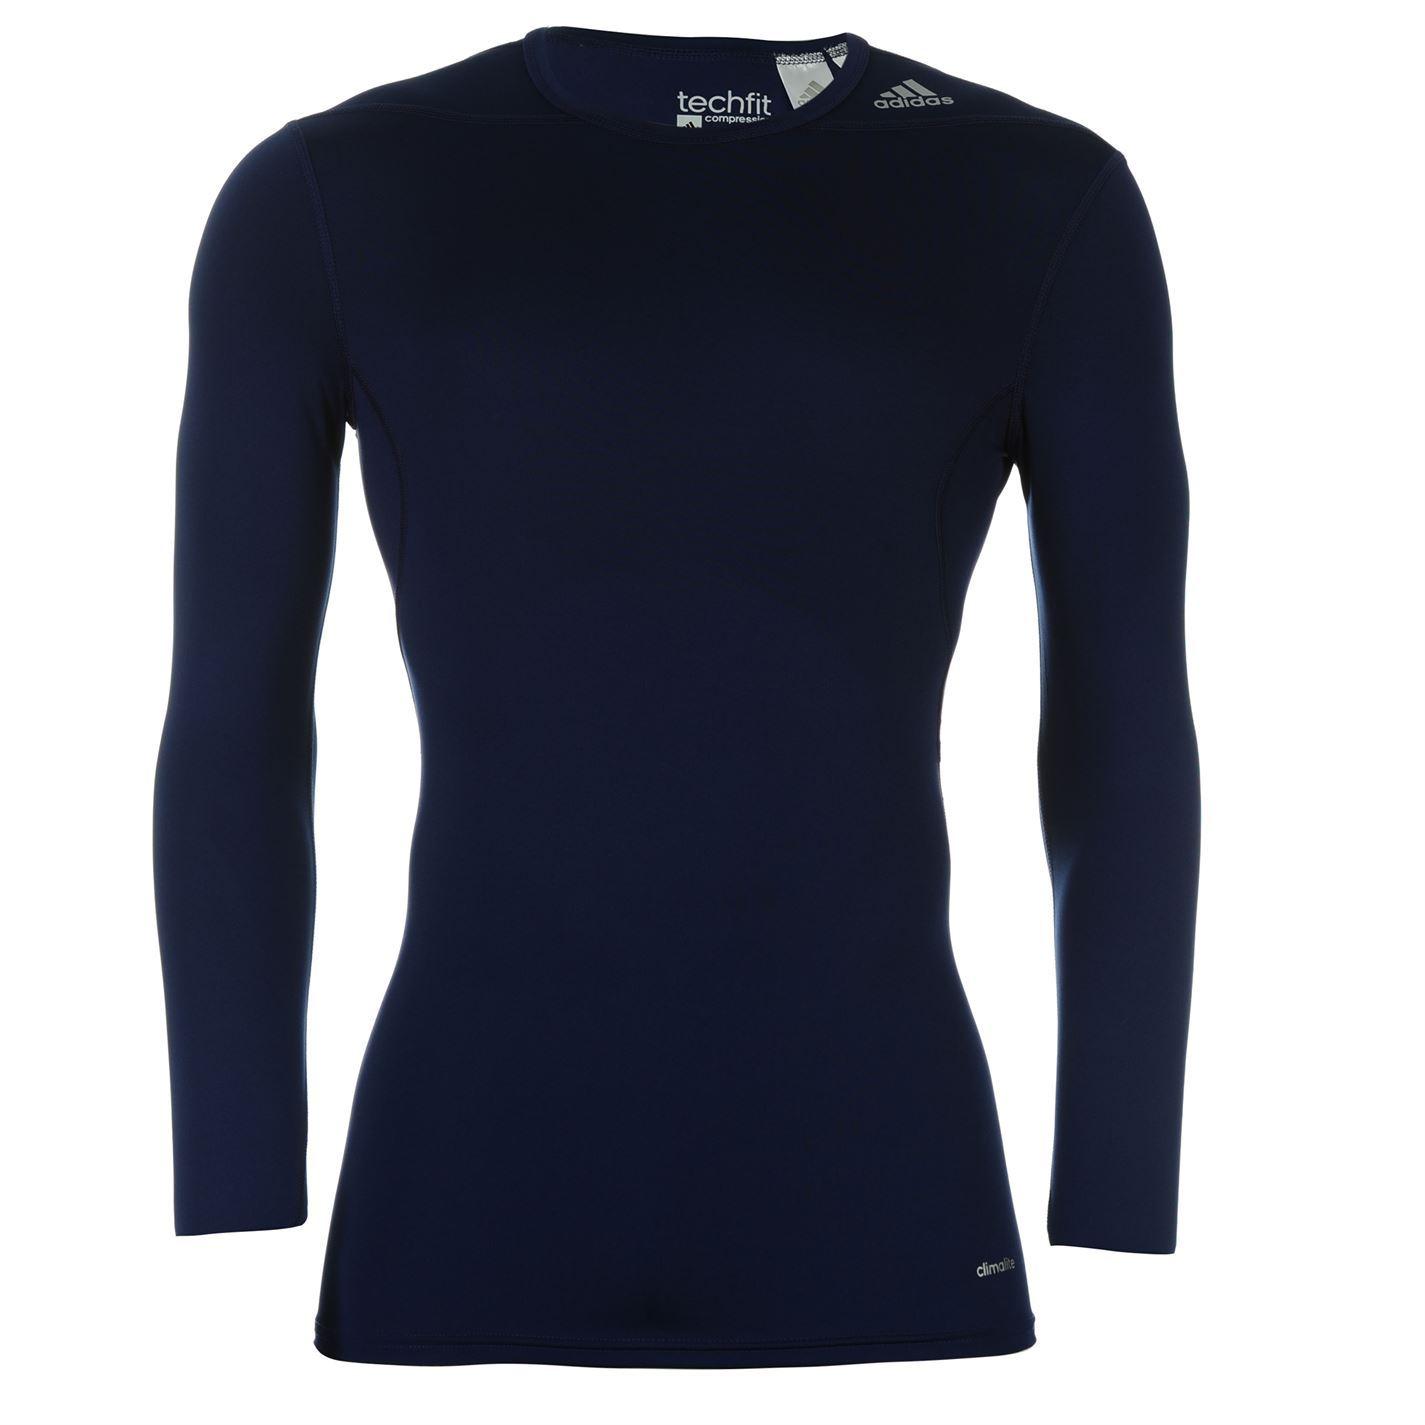 adidas-Mens-Base-Tech-Fit-Long-Sleeve-Top-